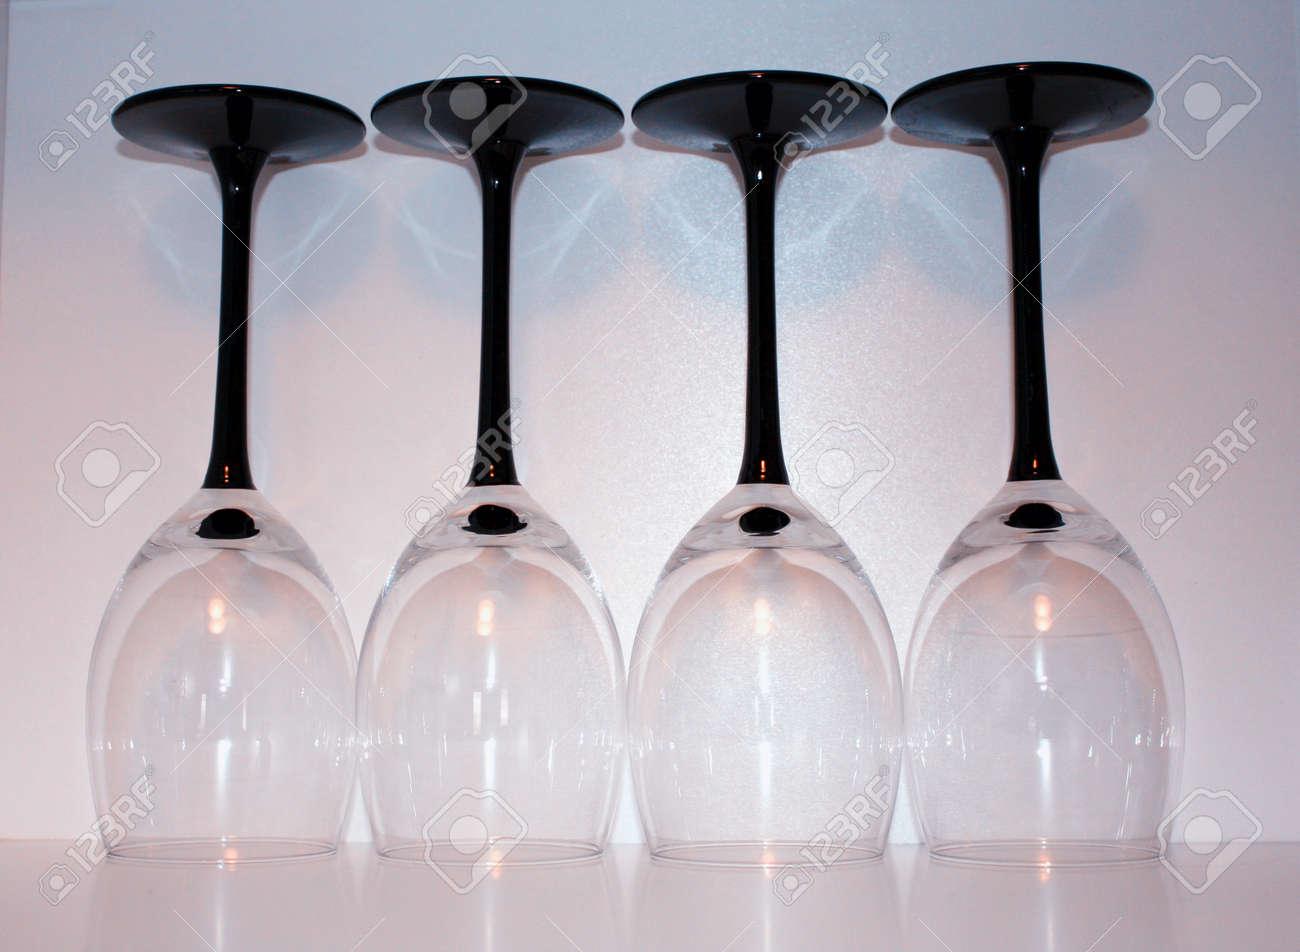 White glass against a white background - 157151941